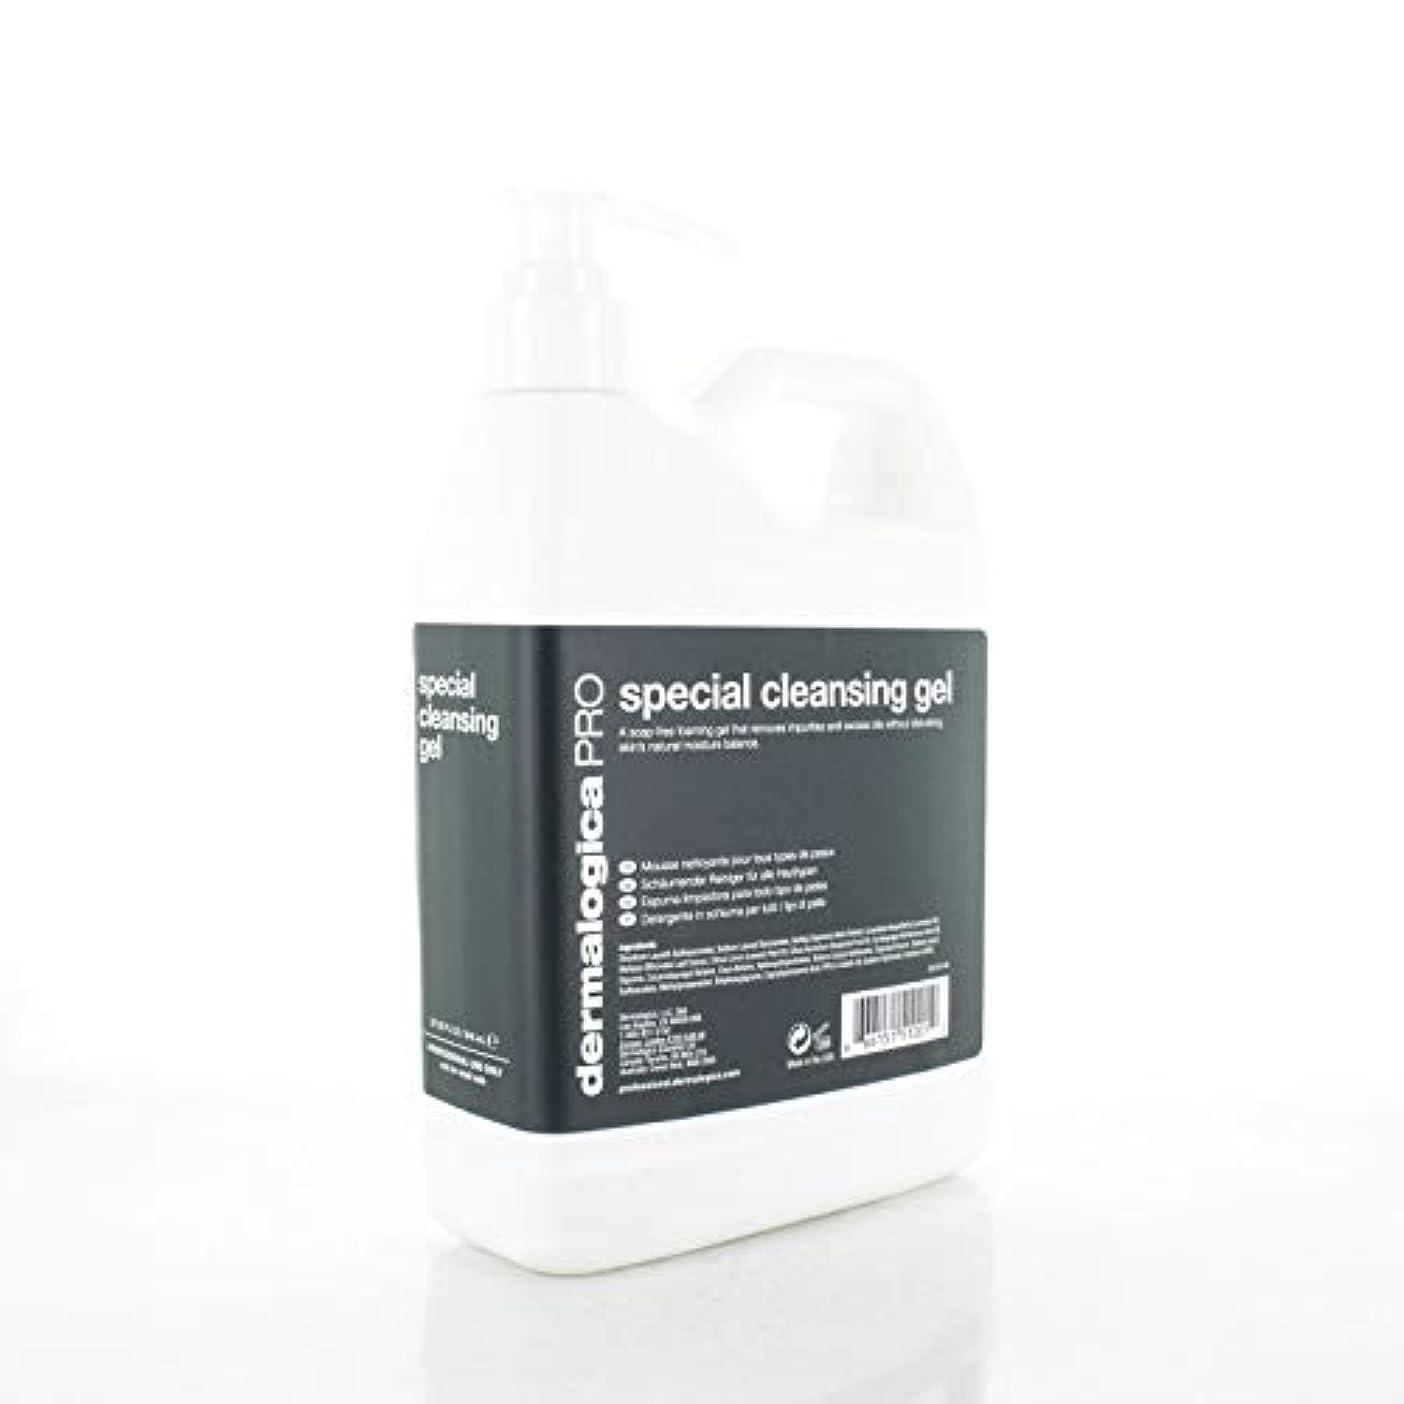 Dermalogica Special Cleansing Gel 32 oz